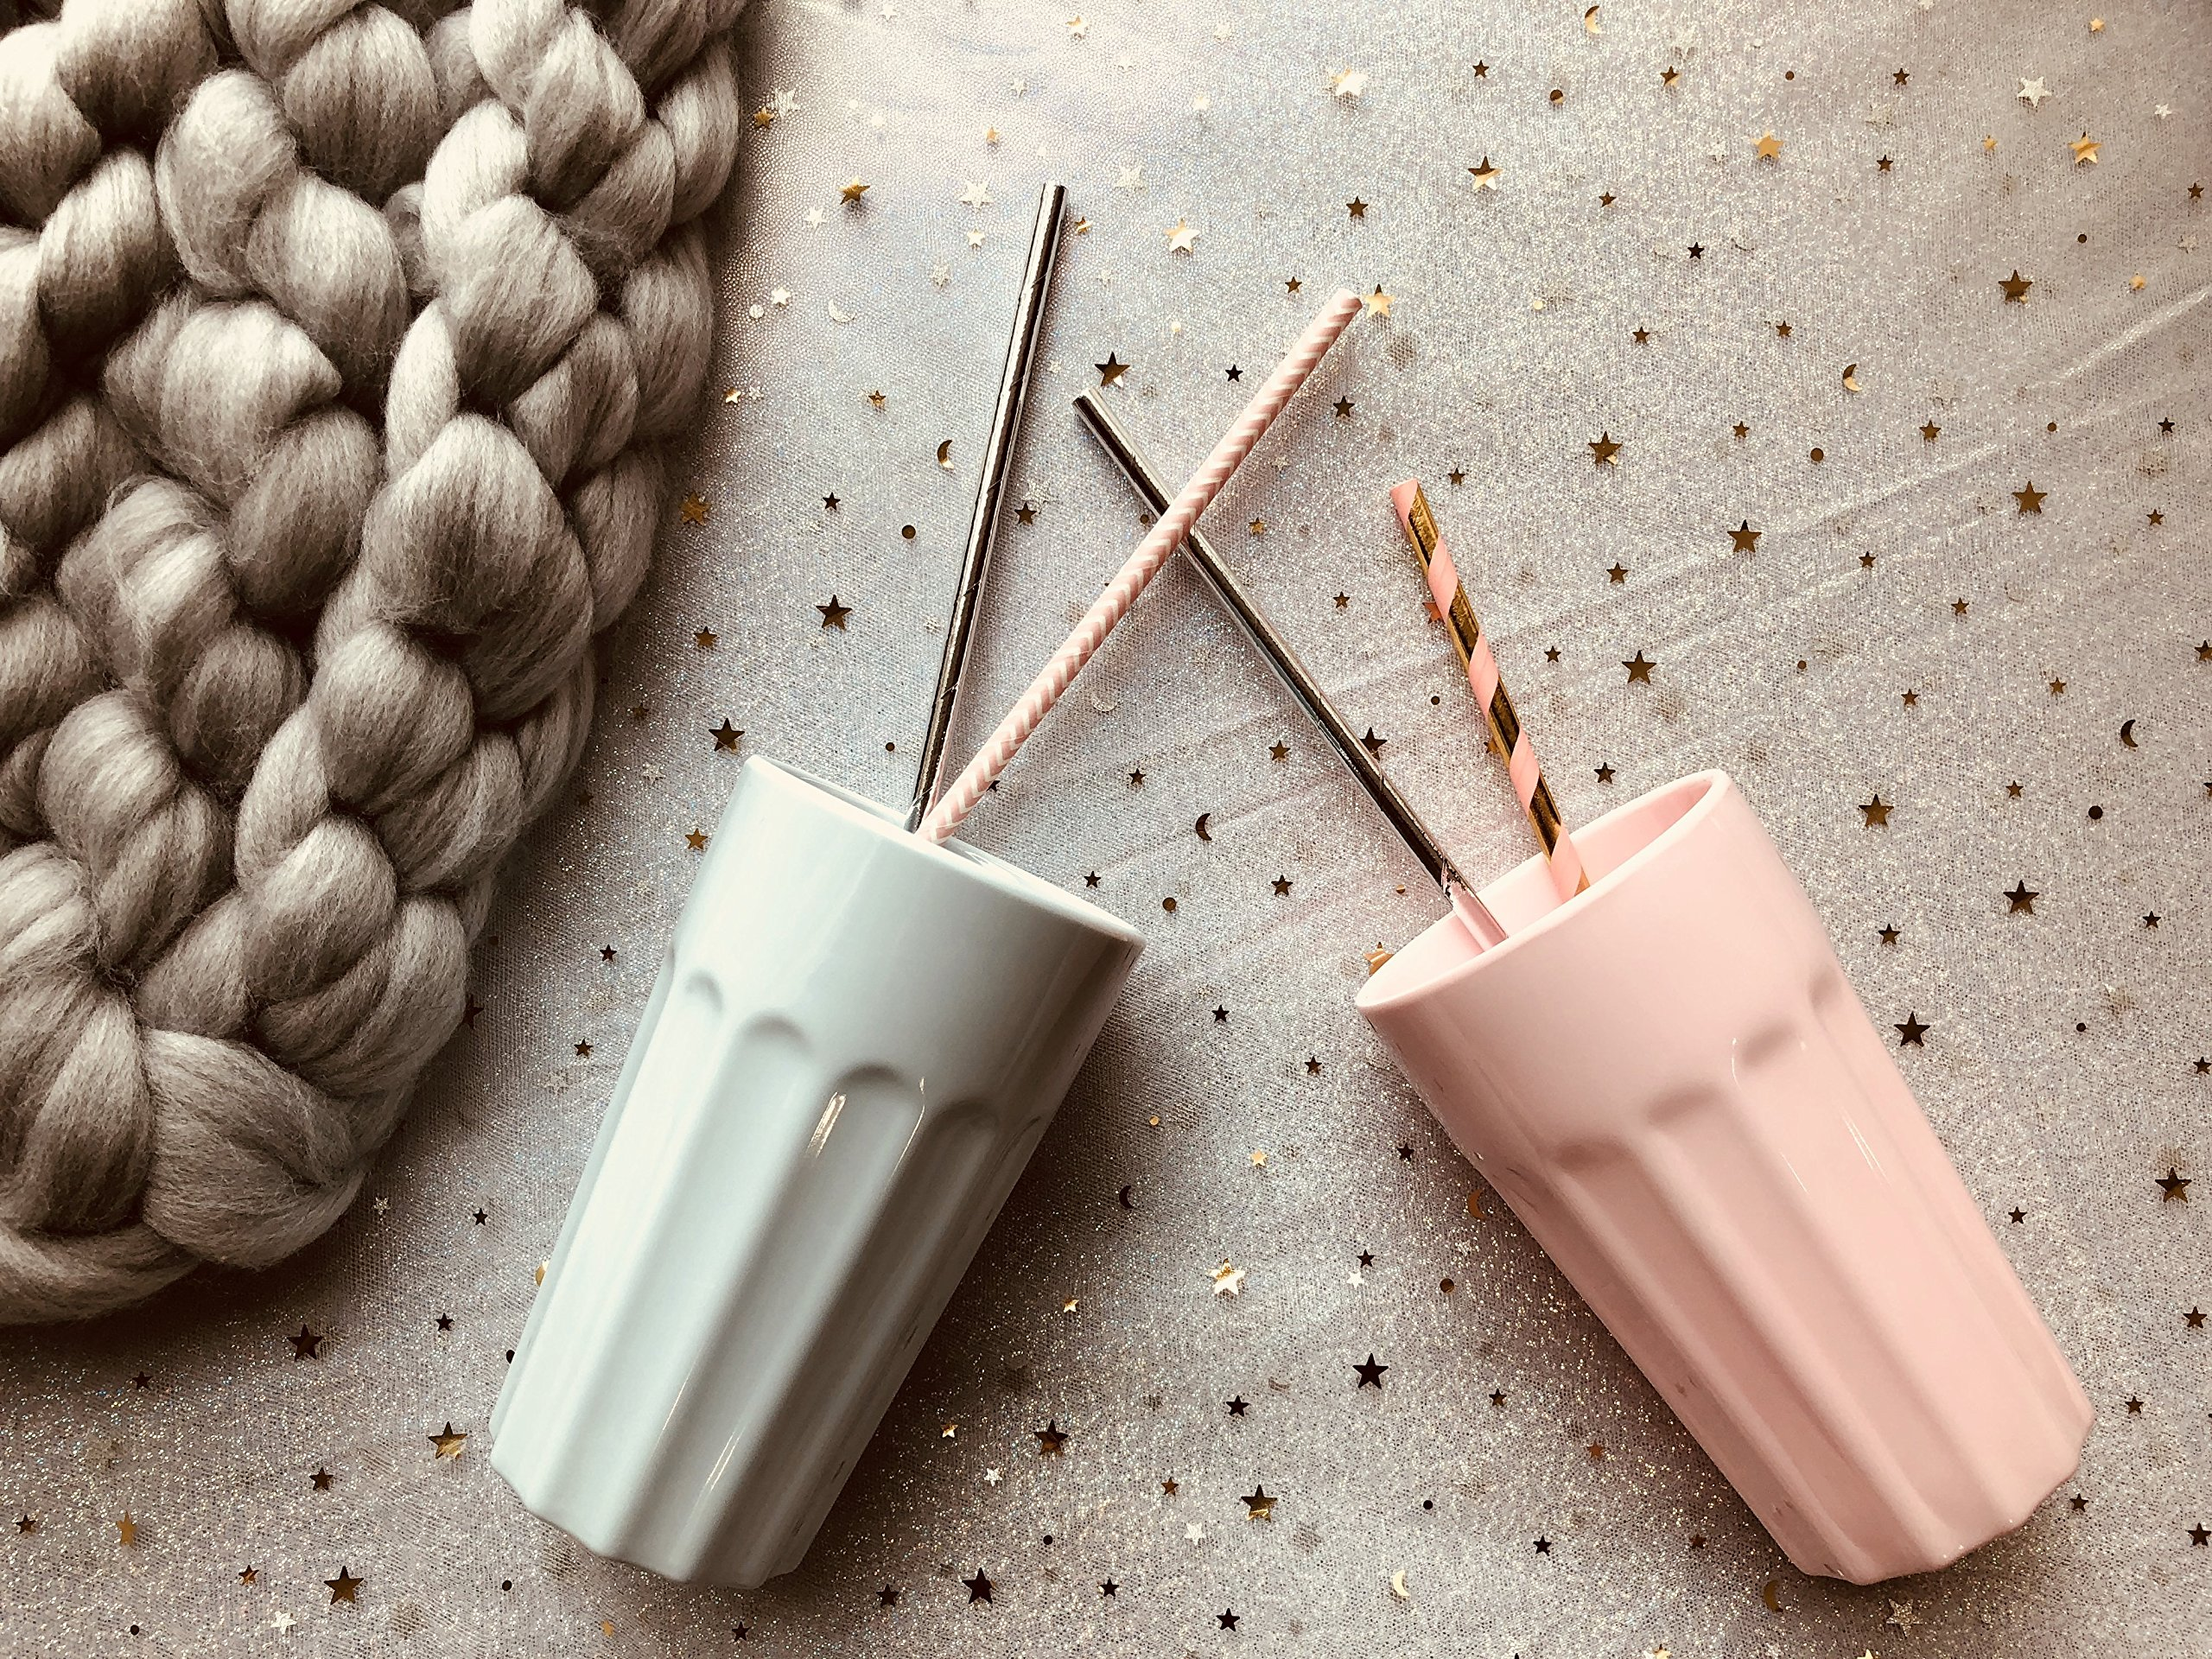 TP up! Unbreakable Melamine Plastic 13.5oz Large Cups,Mixed Colors,Set of 2 (Violet&Grey)